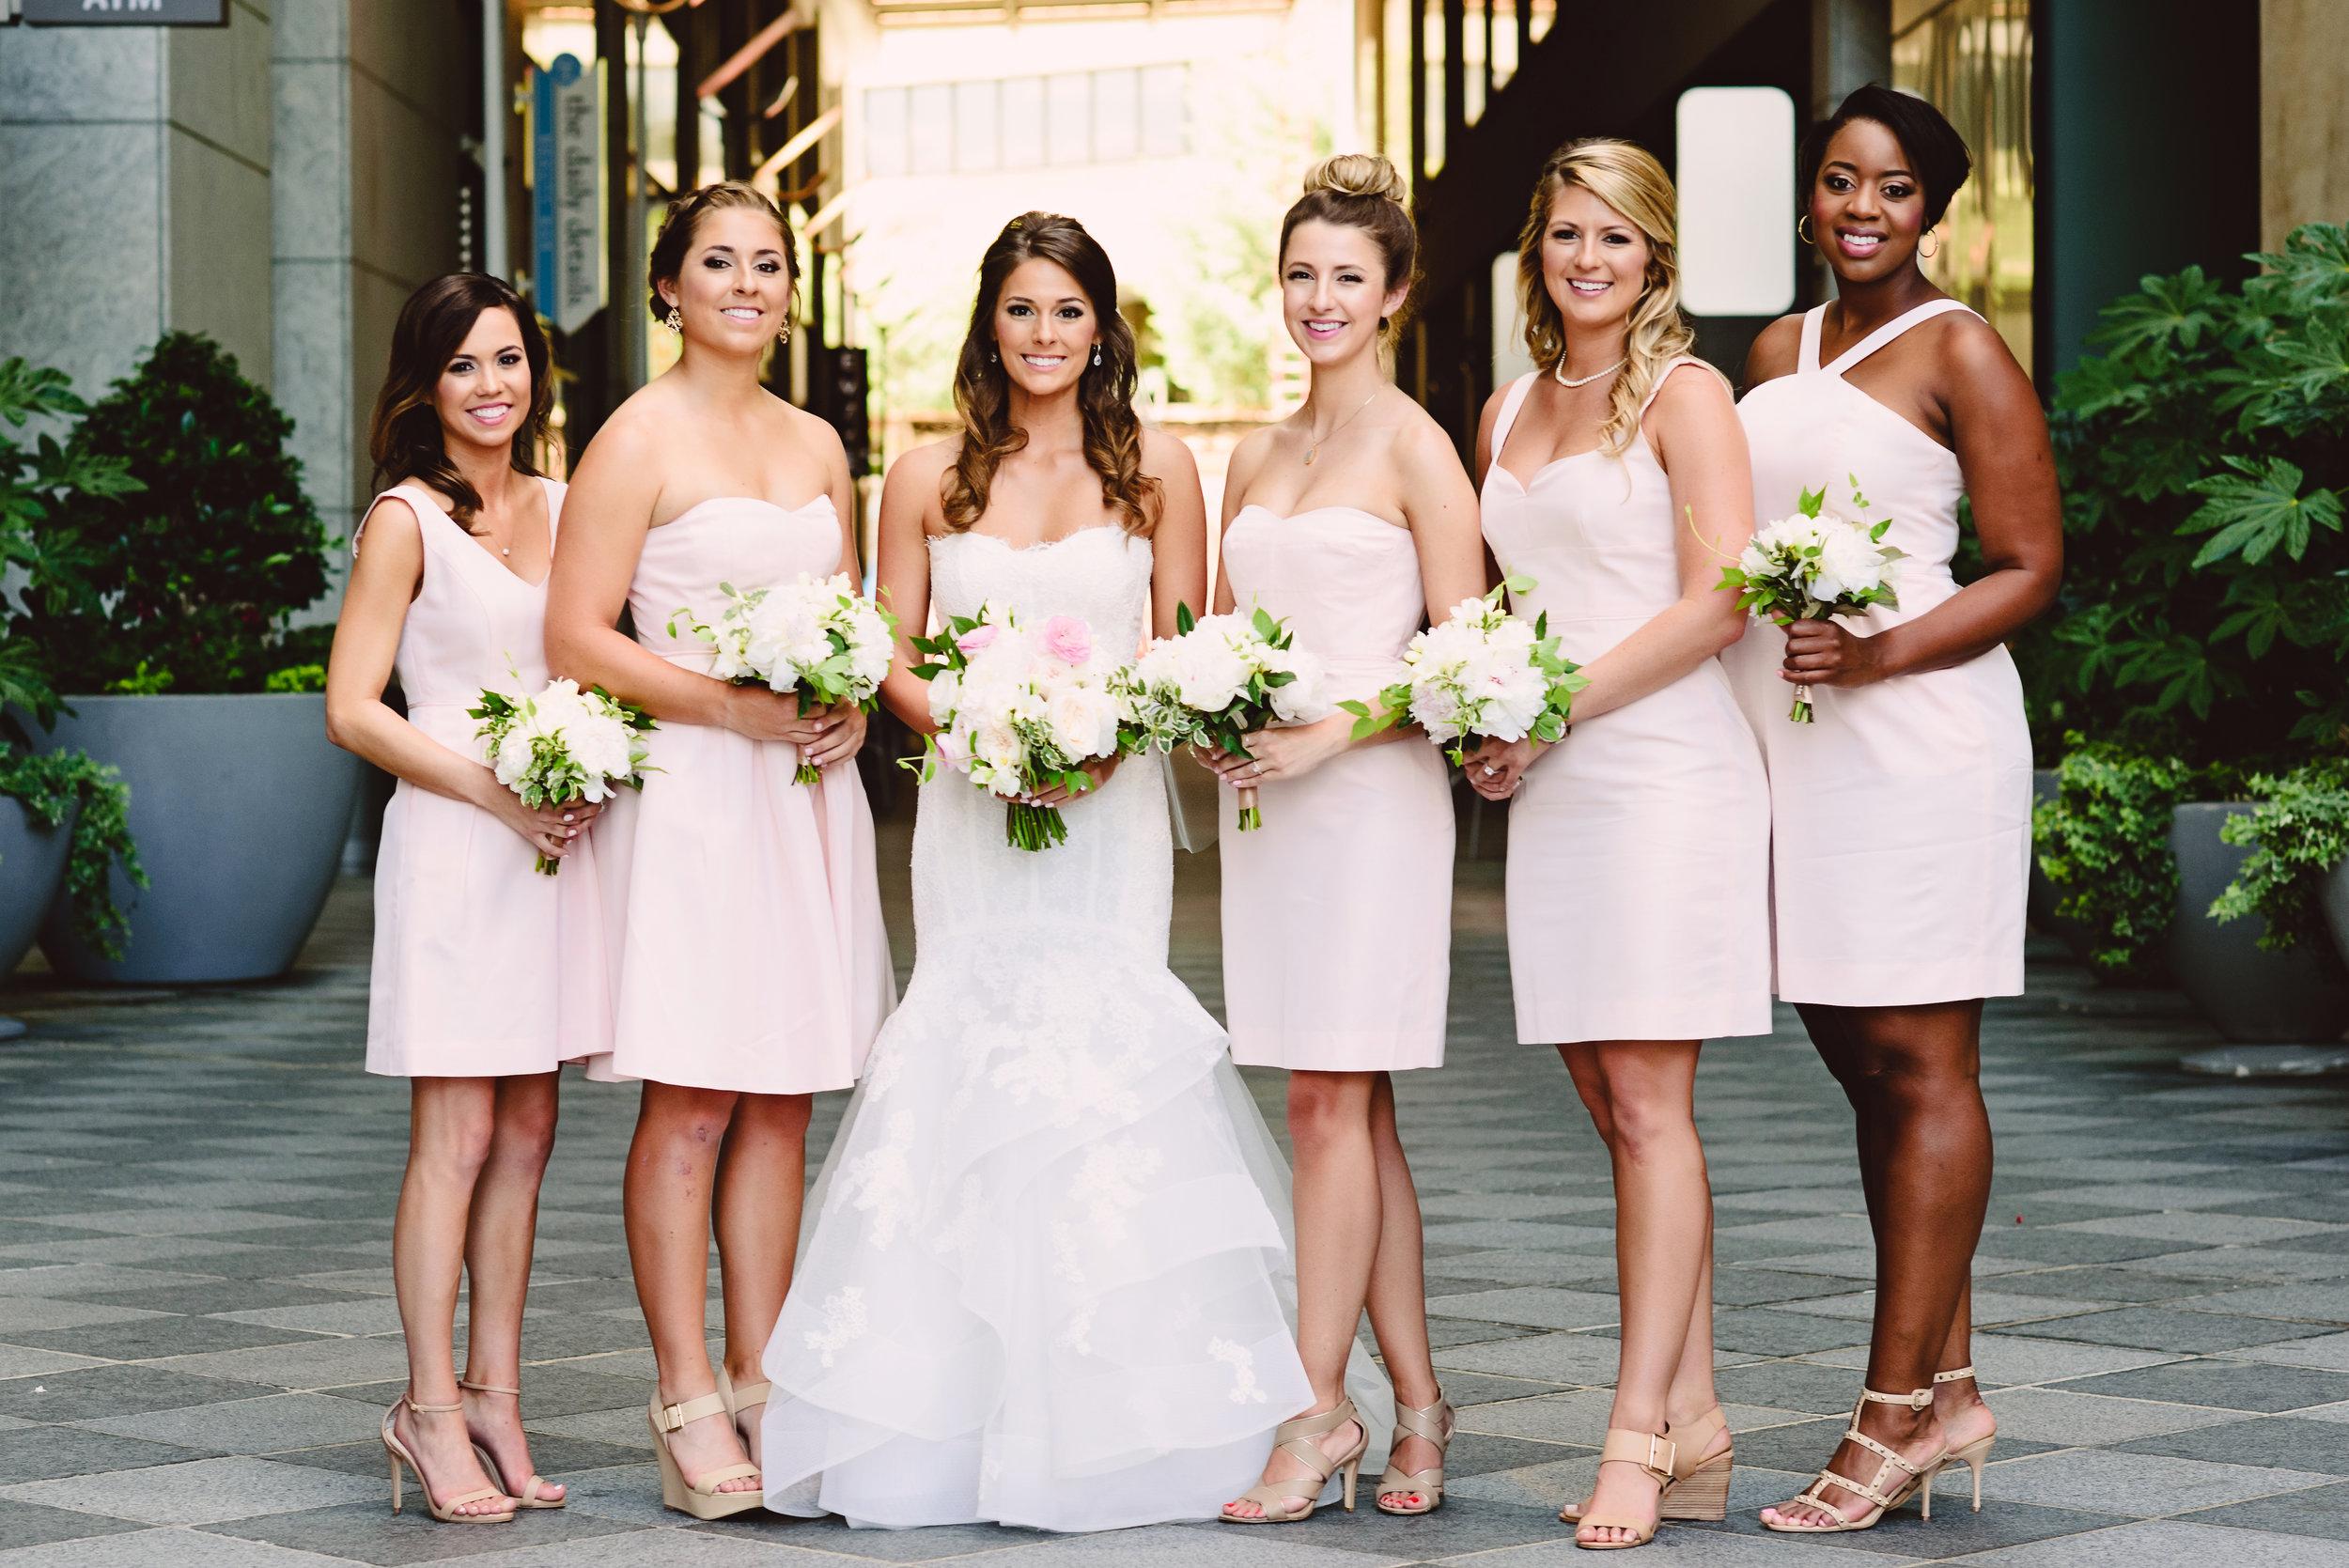 J Crew blush pink bridesmaid dress, Short bridesmaid dresses, Bridesmaid bouquets, Blush ivory and greenery wedding inspiration, Mint Museum Uptown wedding in Charlotte, North Carolina by The Graceful Host